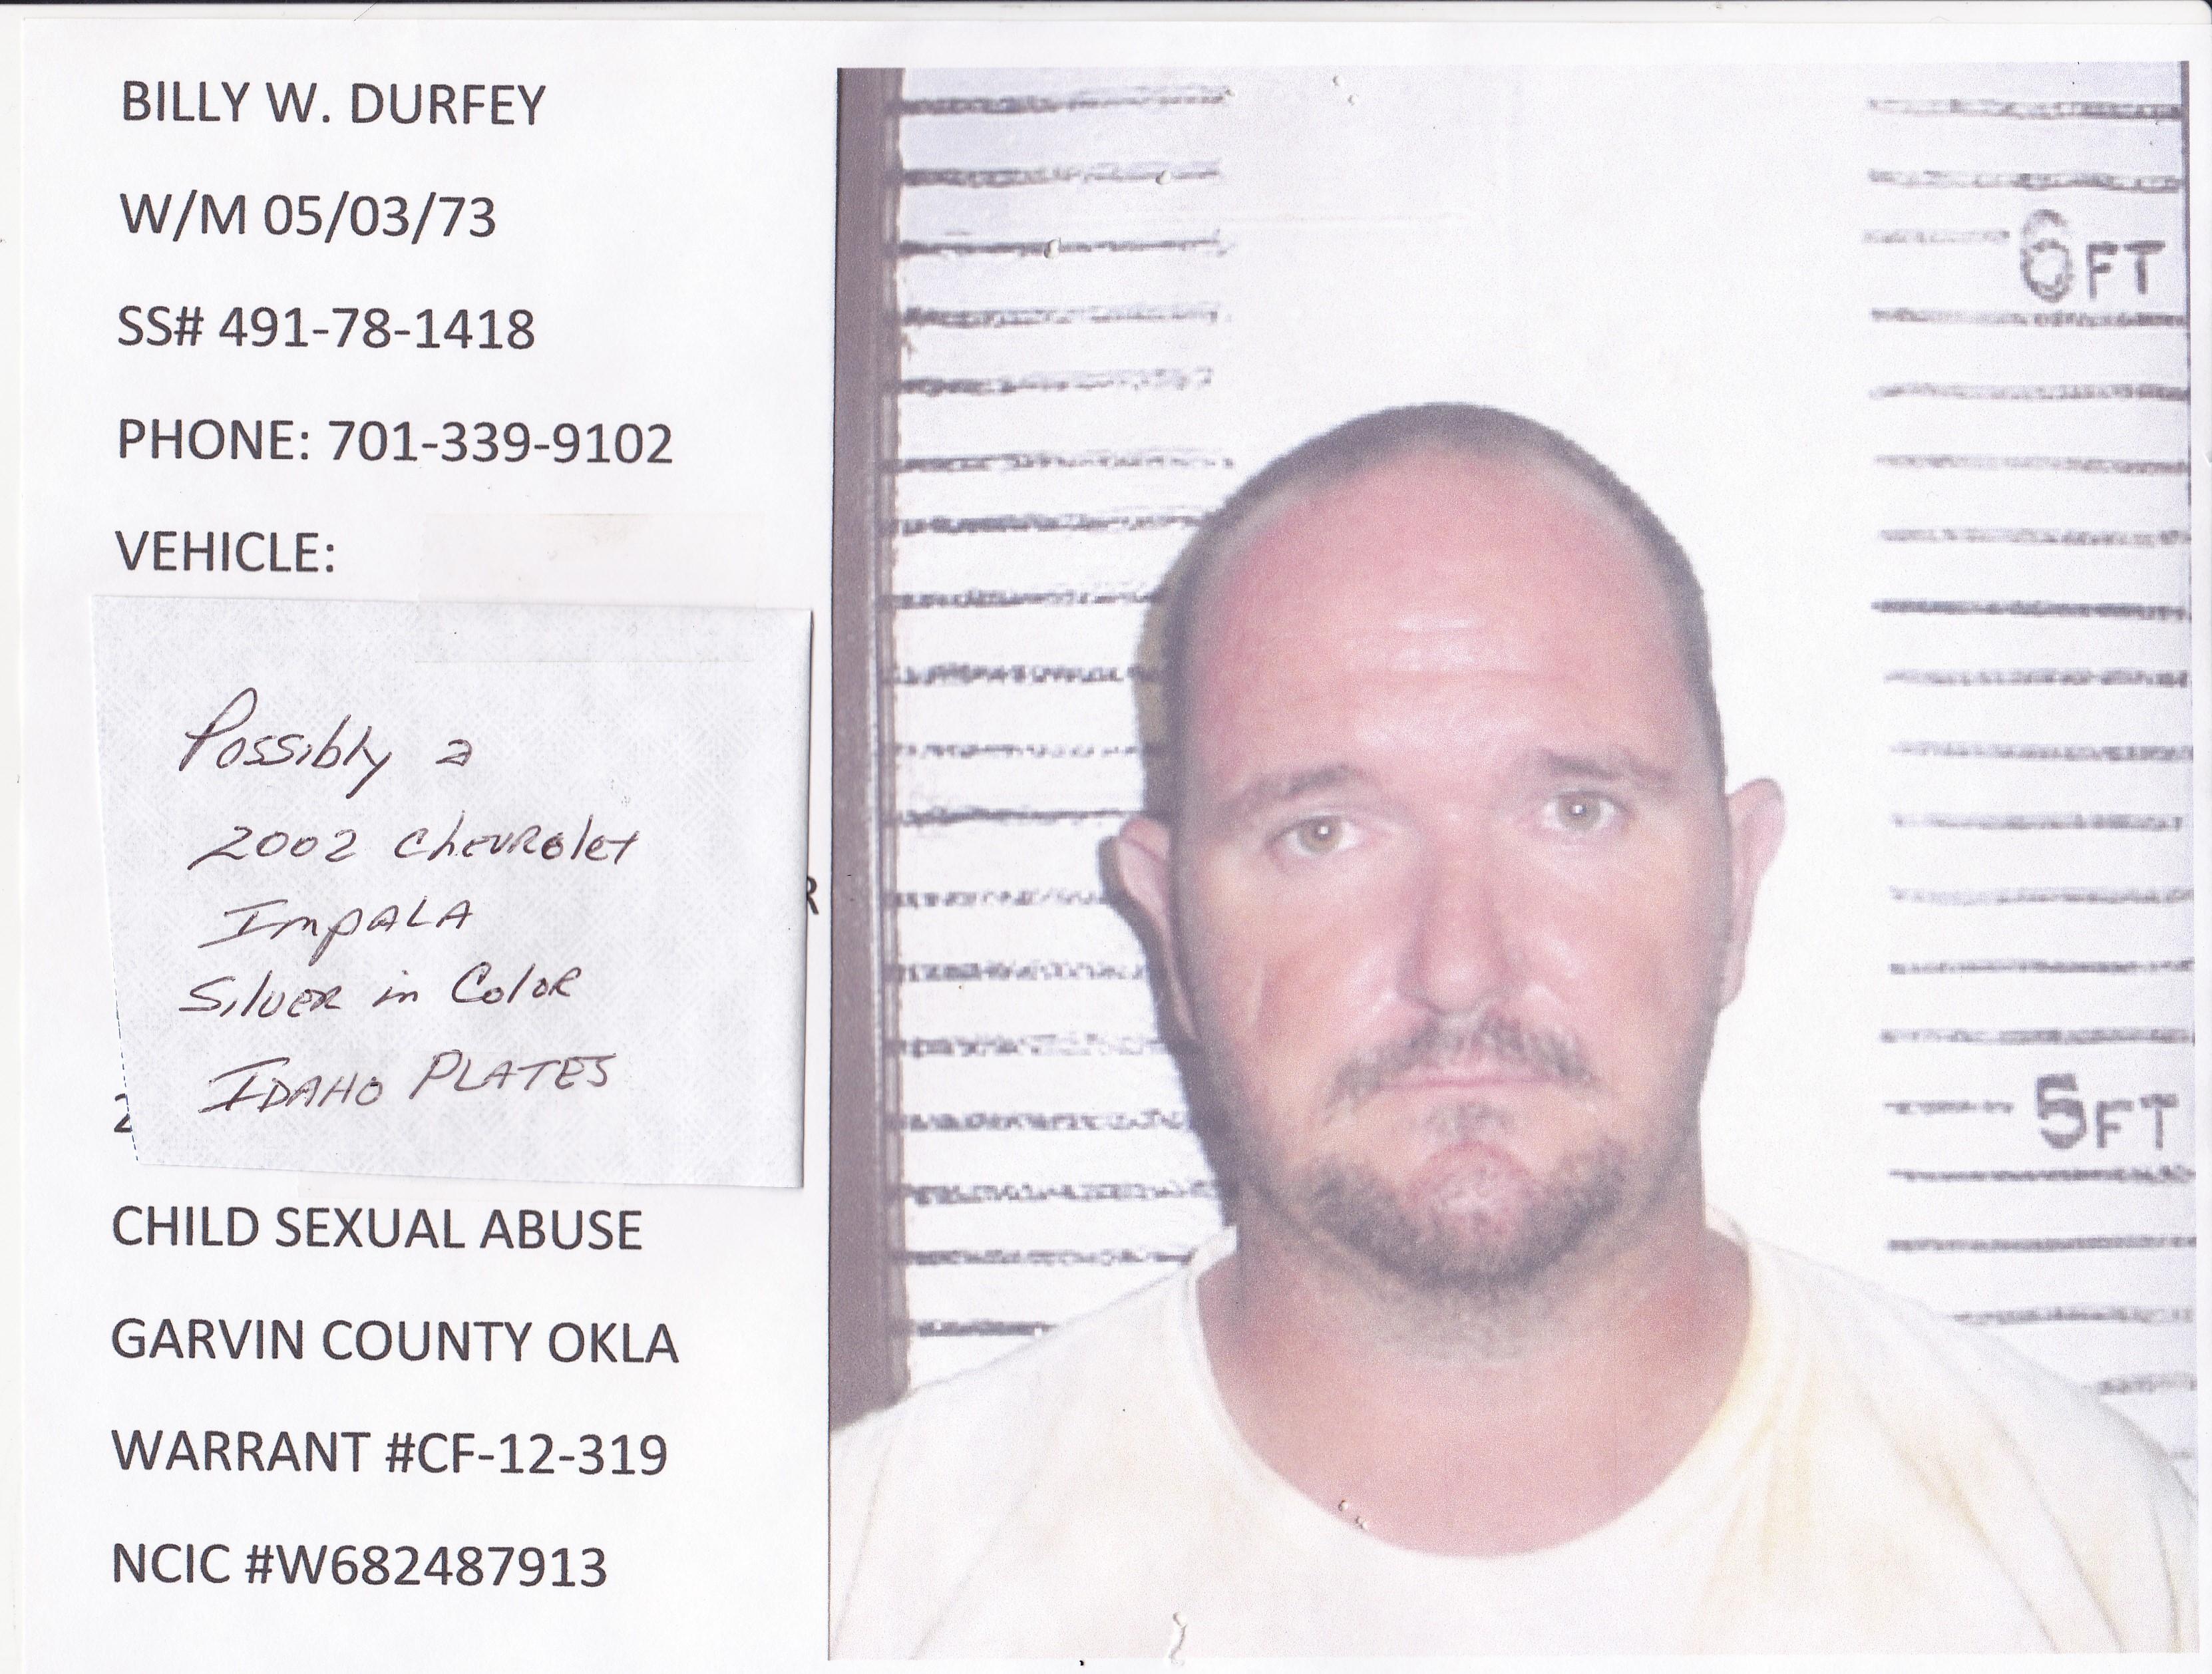 Billy Durfey